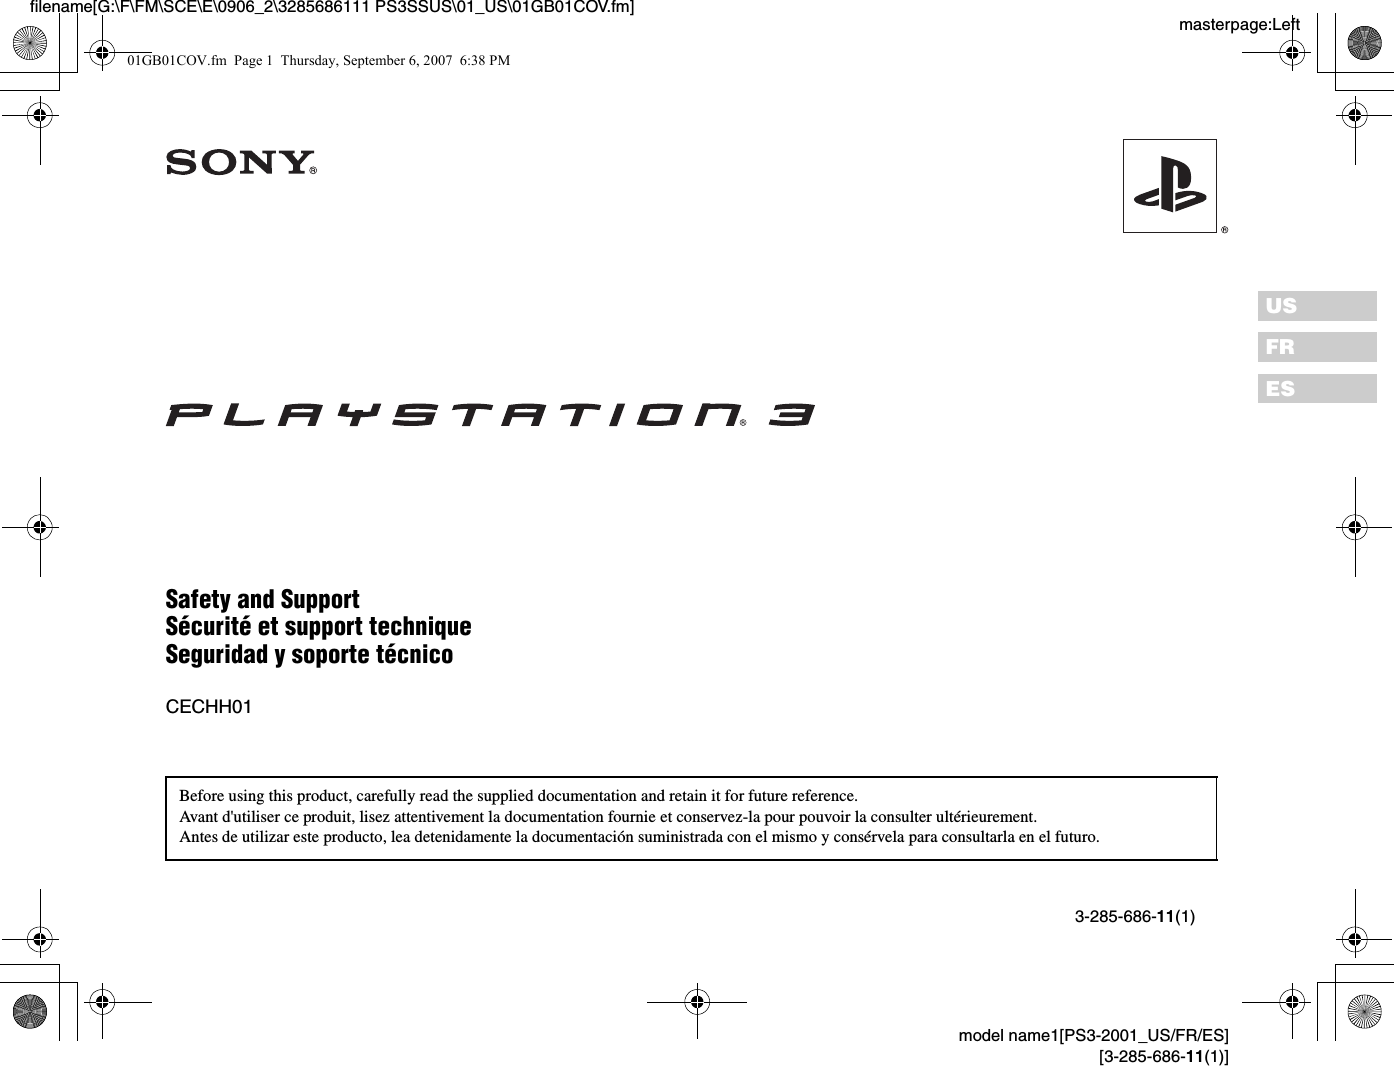 sony cbeh1300 playstation 3 user manual playstation 3 rh usermanual wiki Sony PS2 PlayStation 2 Manual PlayStation 1 Instruction Manual